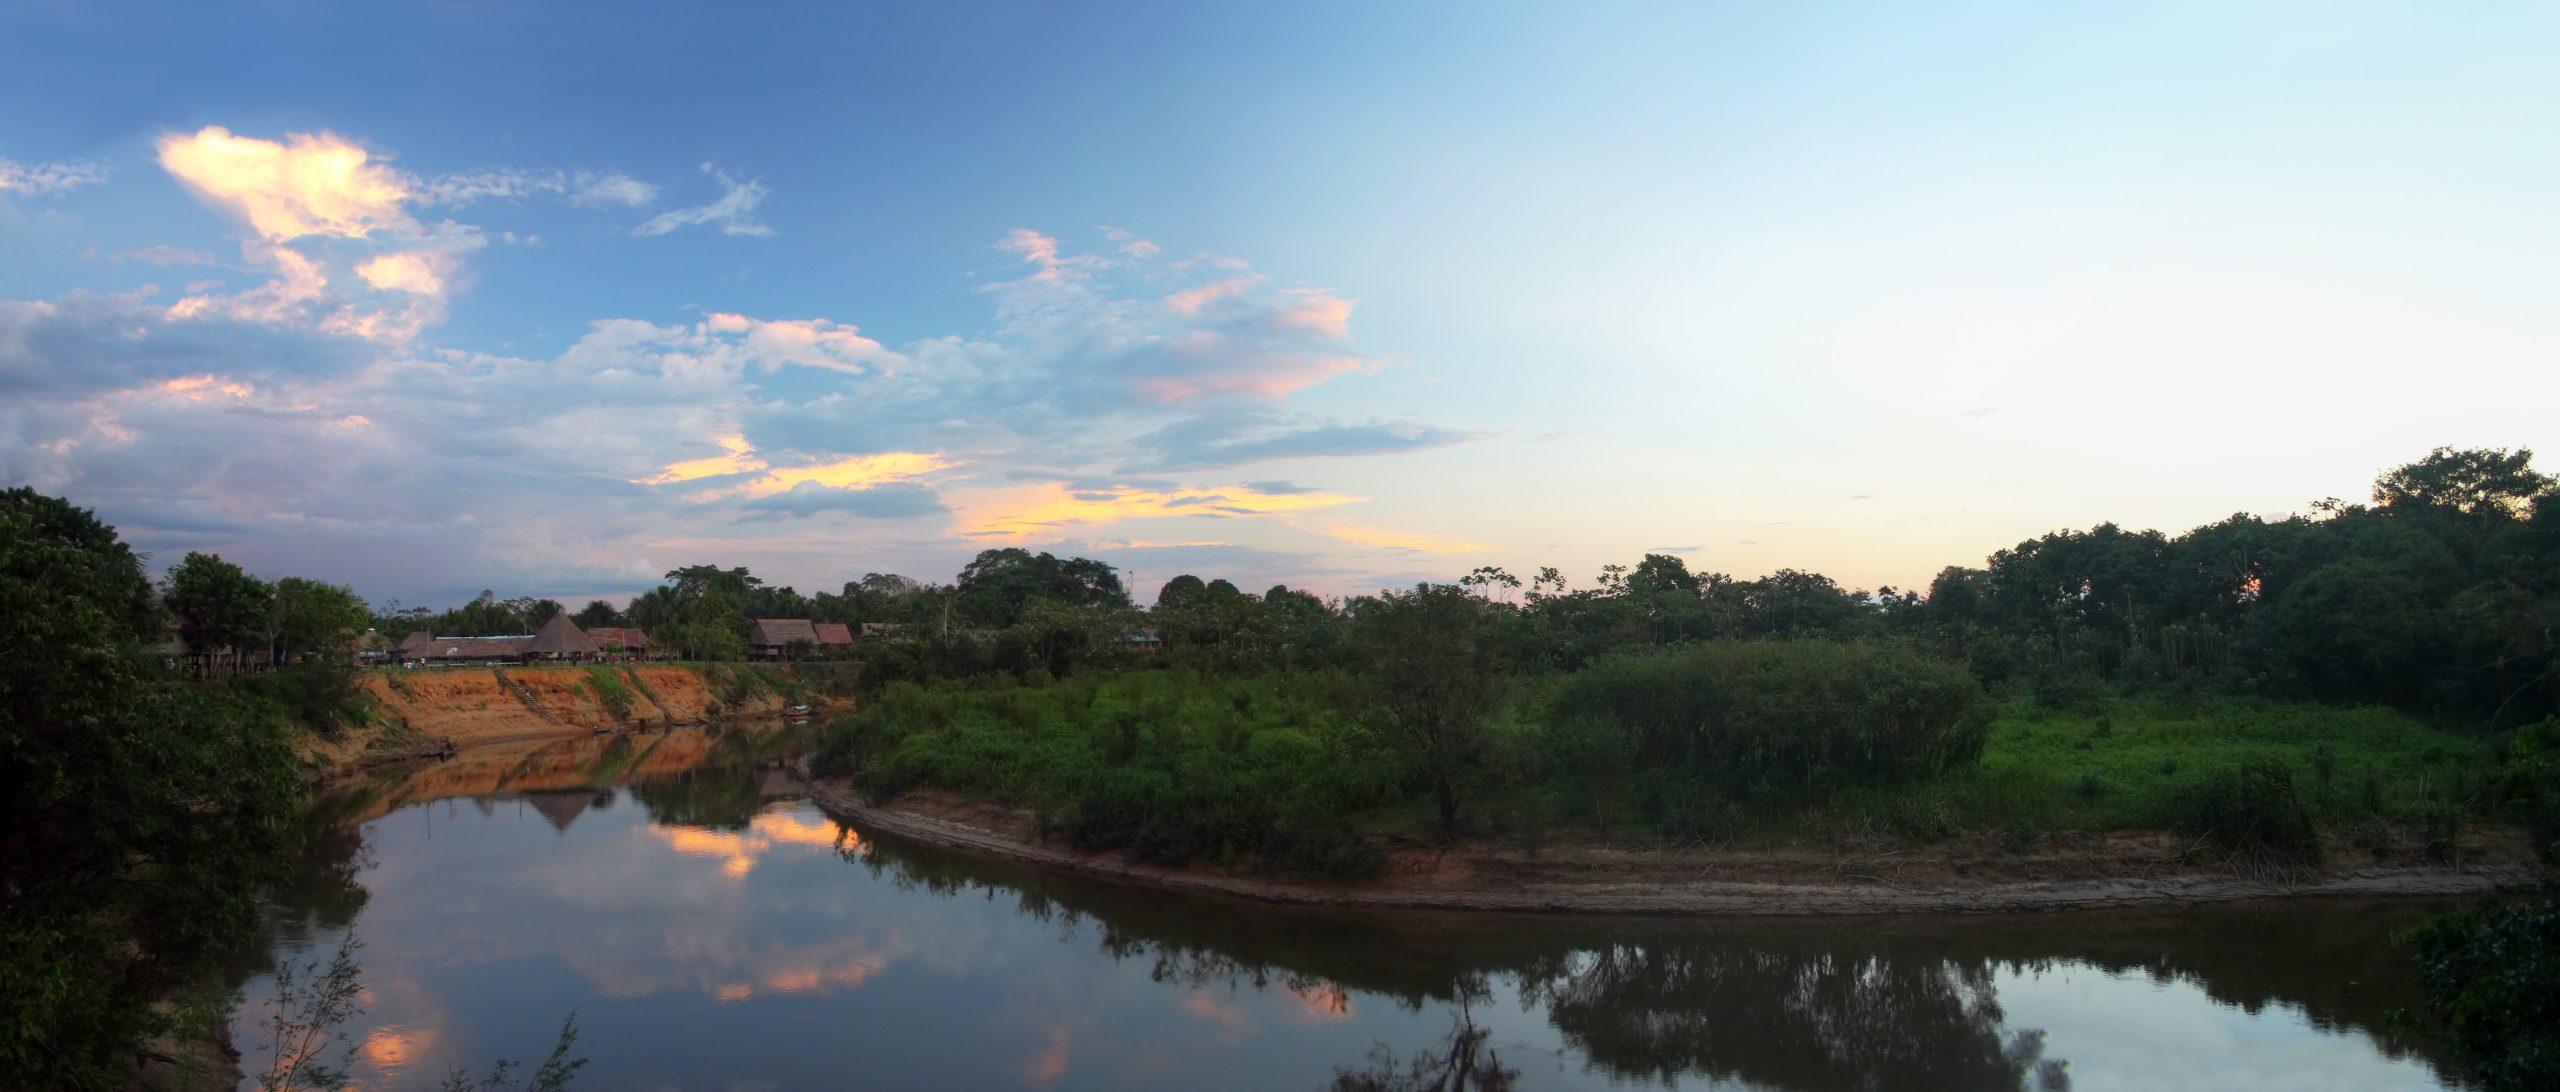 Querida Amazonia: Summary and Analysis